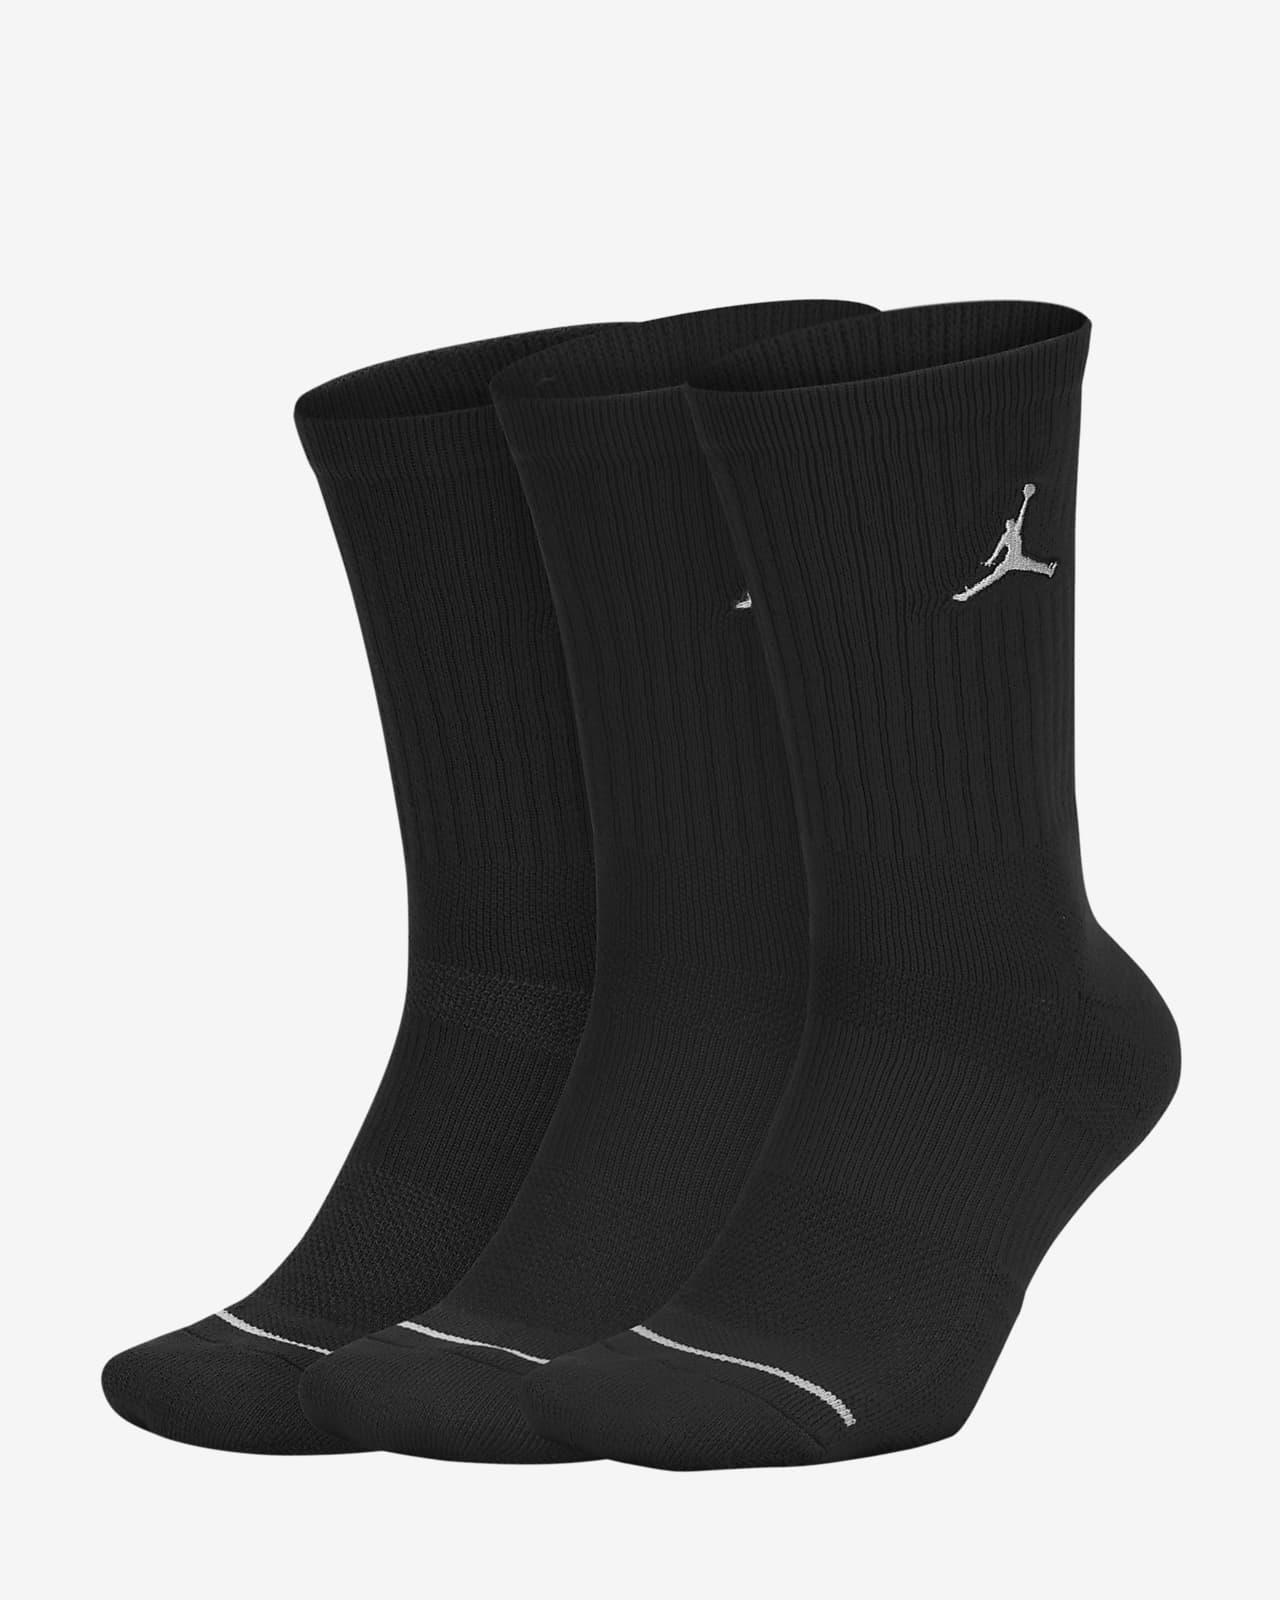 Unisex κάλτσες μεσαίου ύψους Jordan Everyday Max (τρία ζευγάρια)